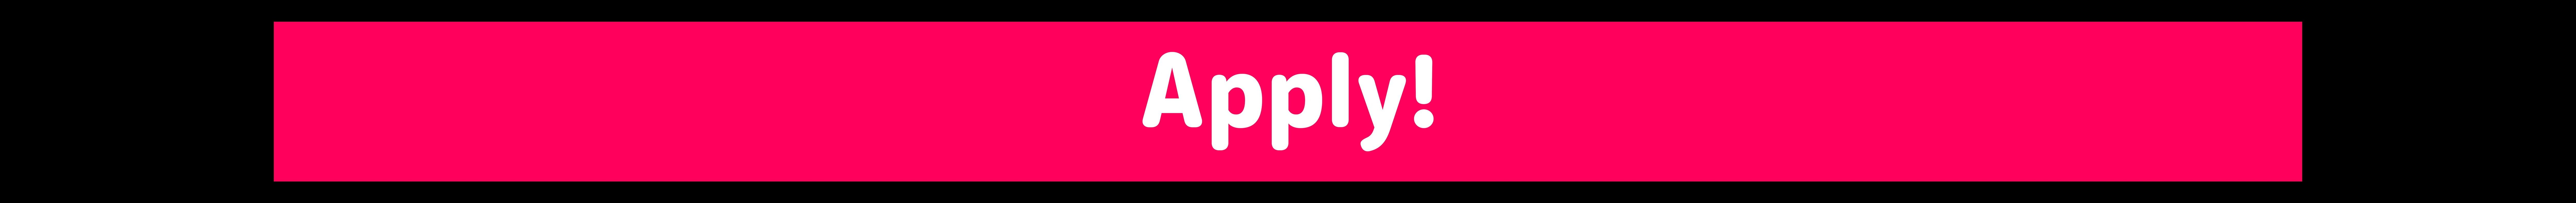 Apply!